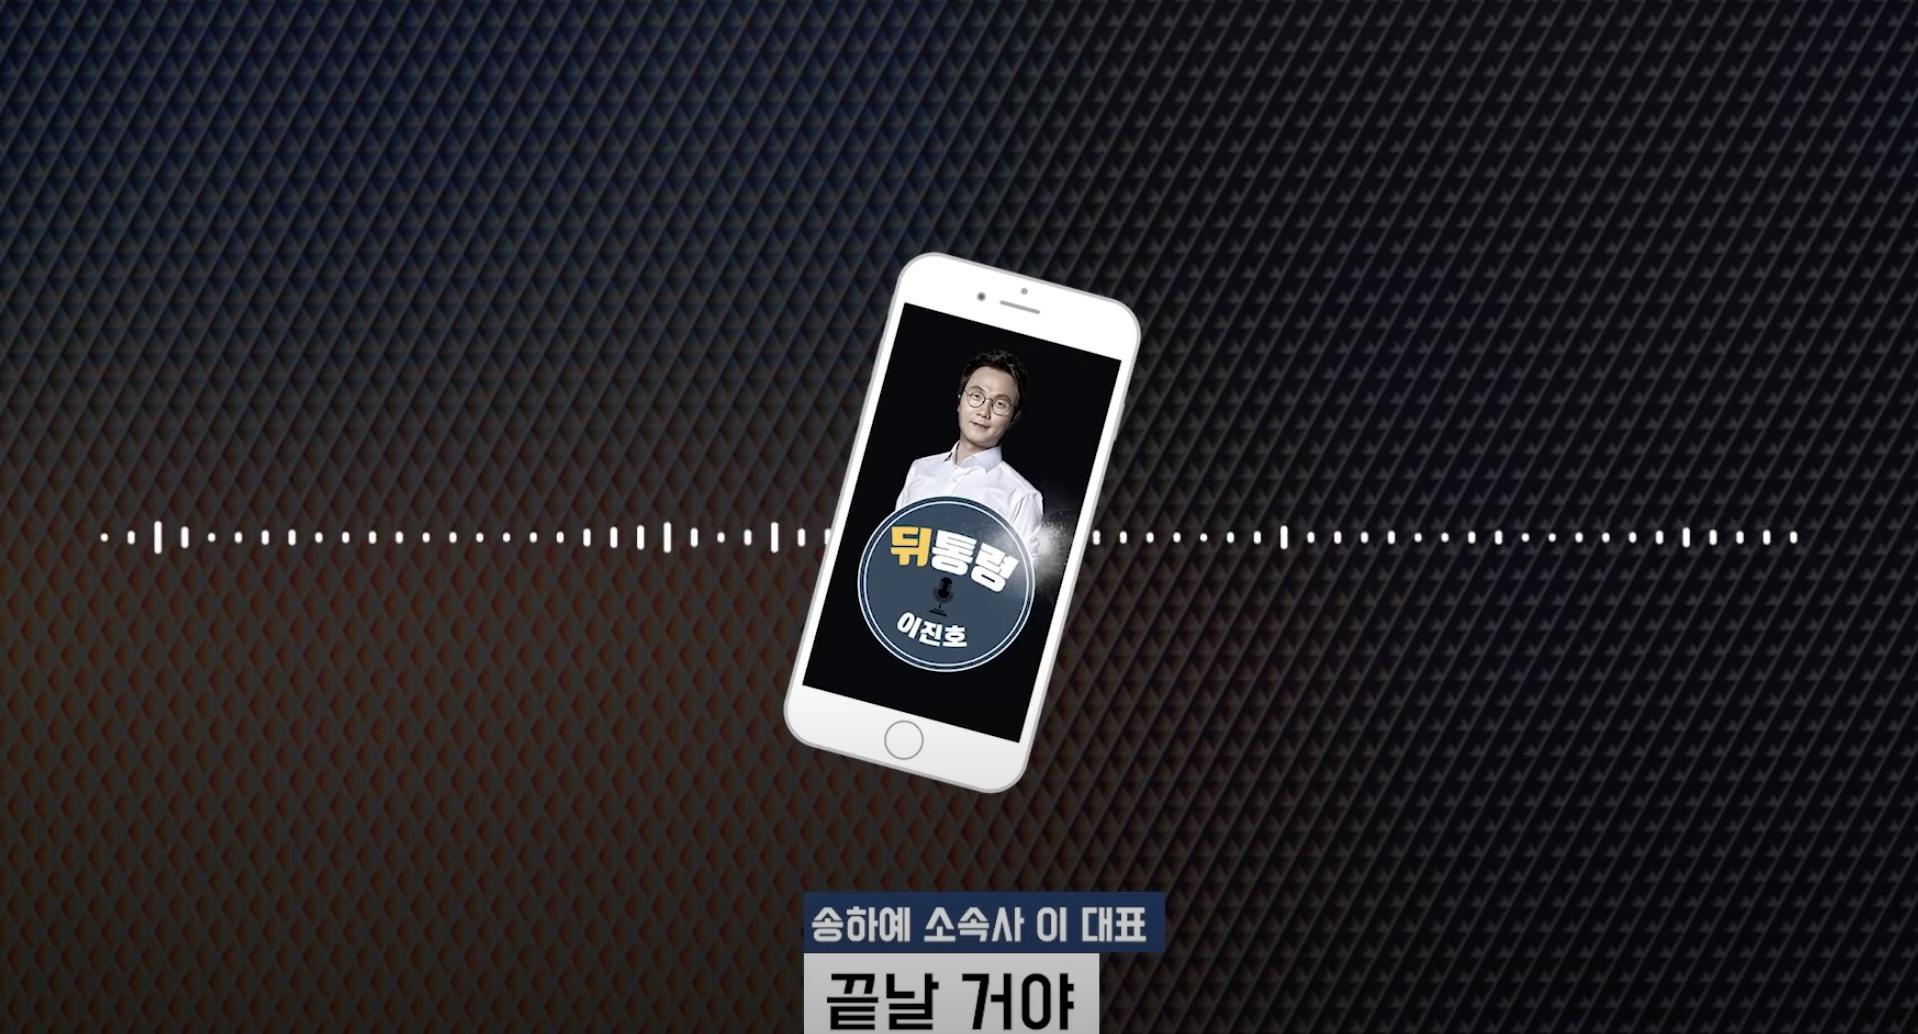 Screenshot 2020-10-16 at 2.31.53 PM